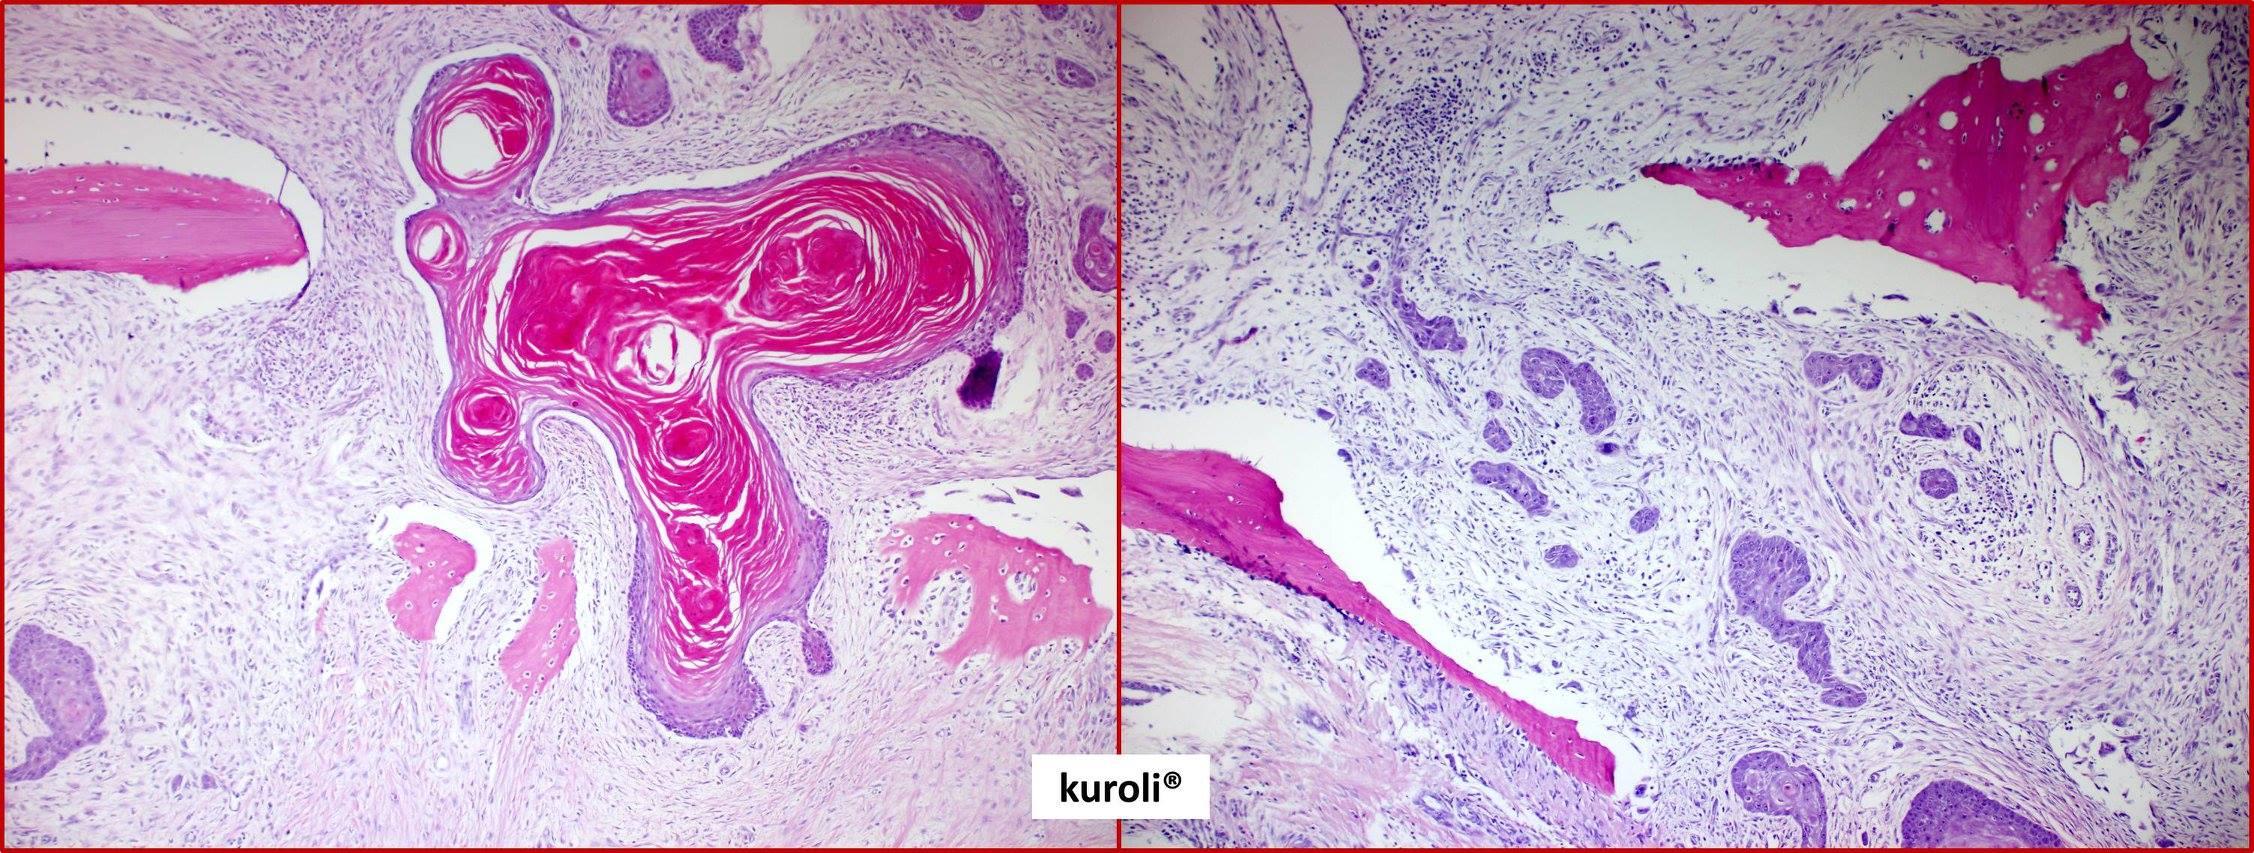 papillomatosis bőrpatológia)